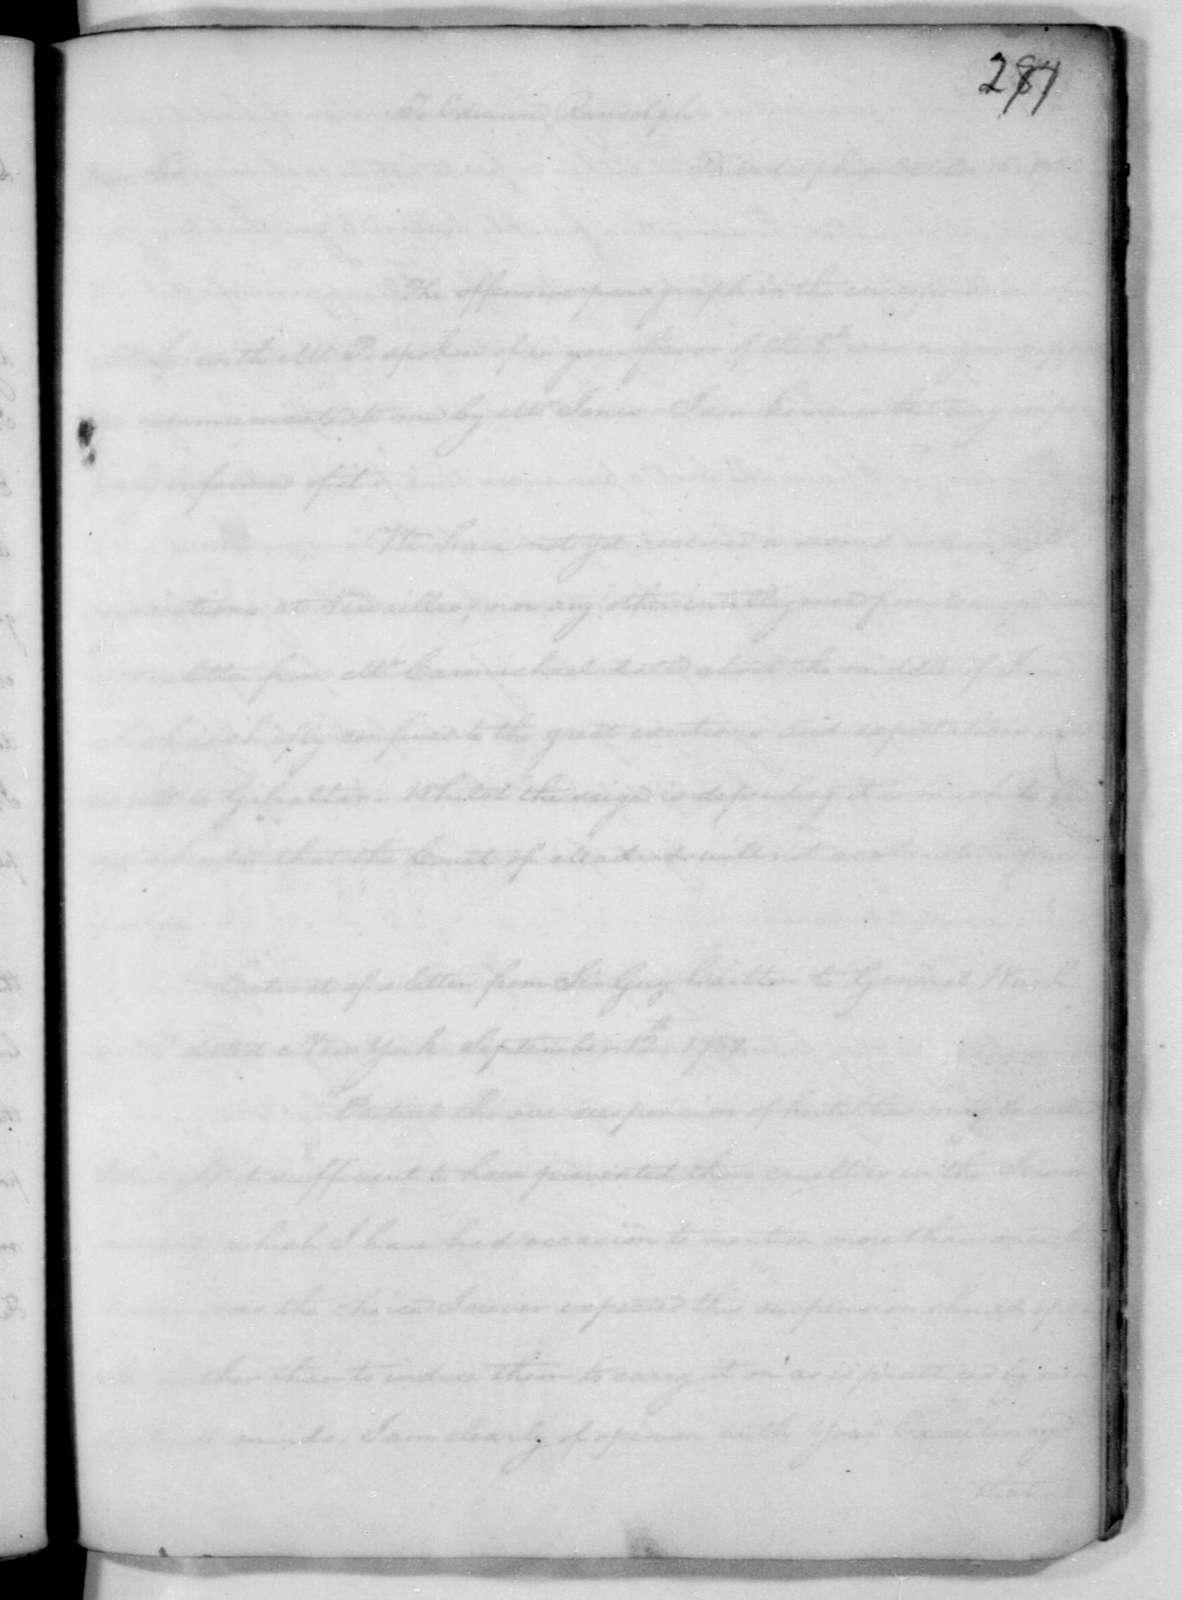 James Madison to Edmund Randolph, October 8, 1782. Fragment.